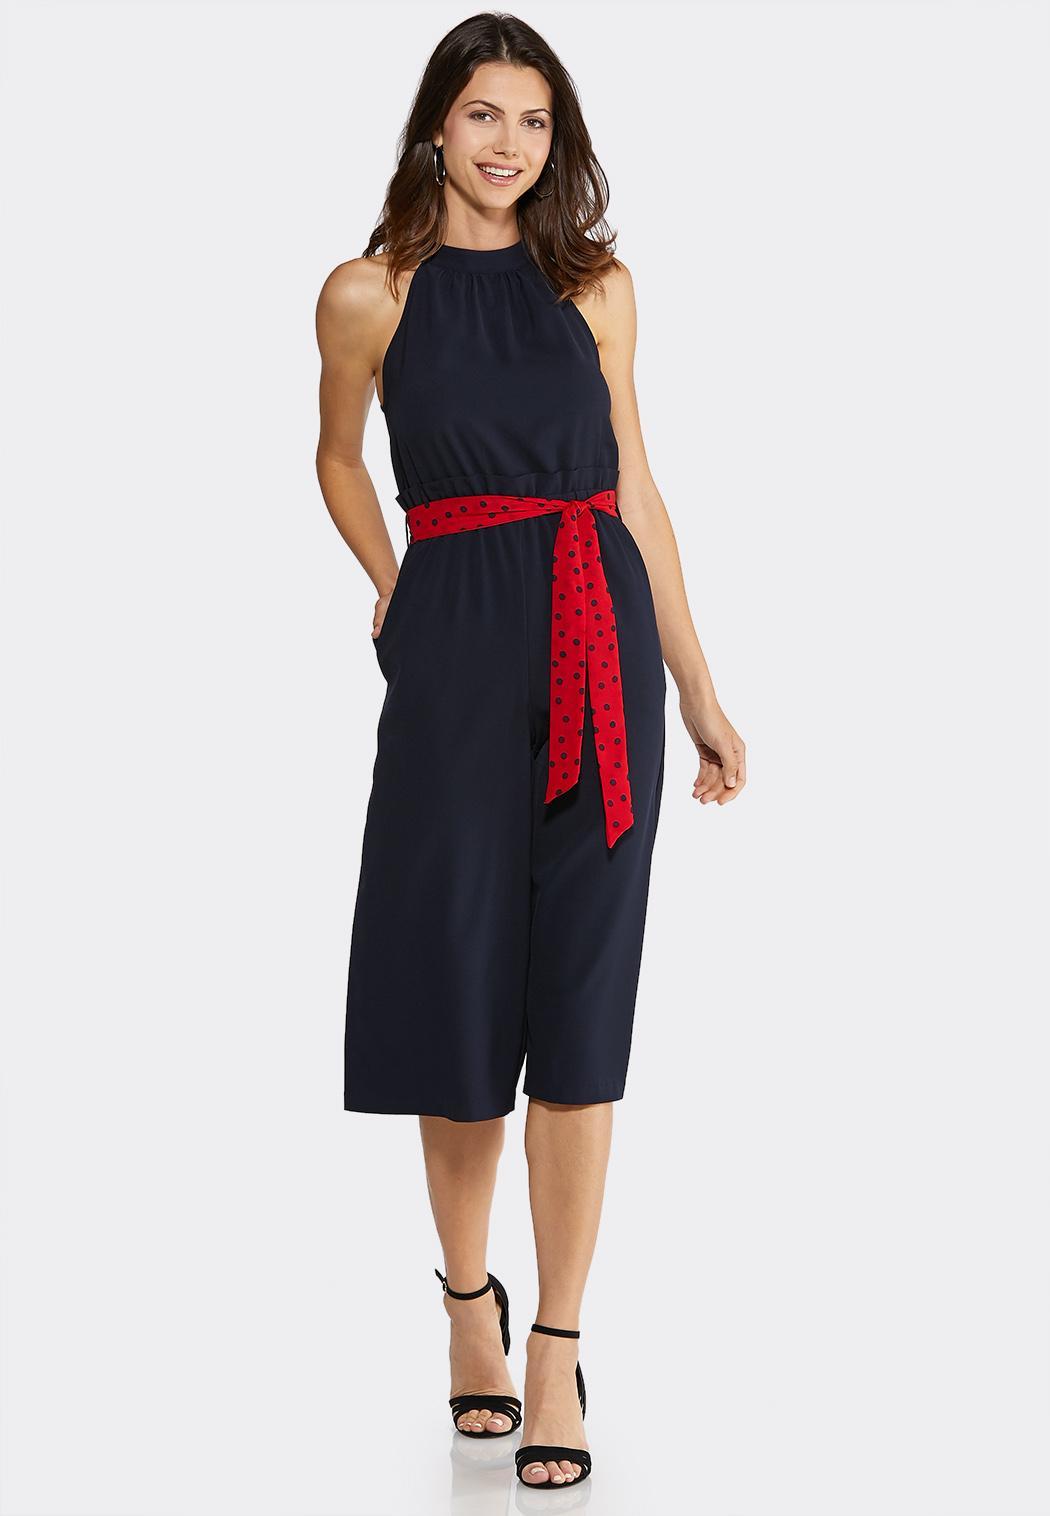 8c94ebbac4e Women s Dresses sizes 2-28 - Spring Dresses